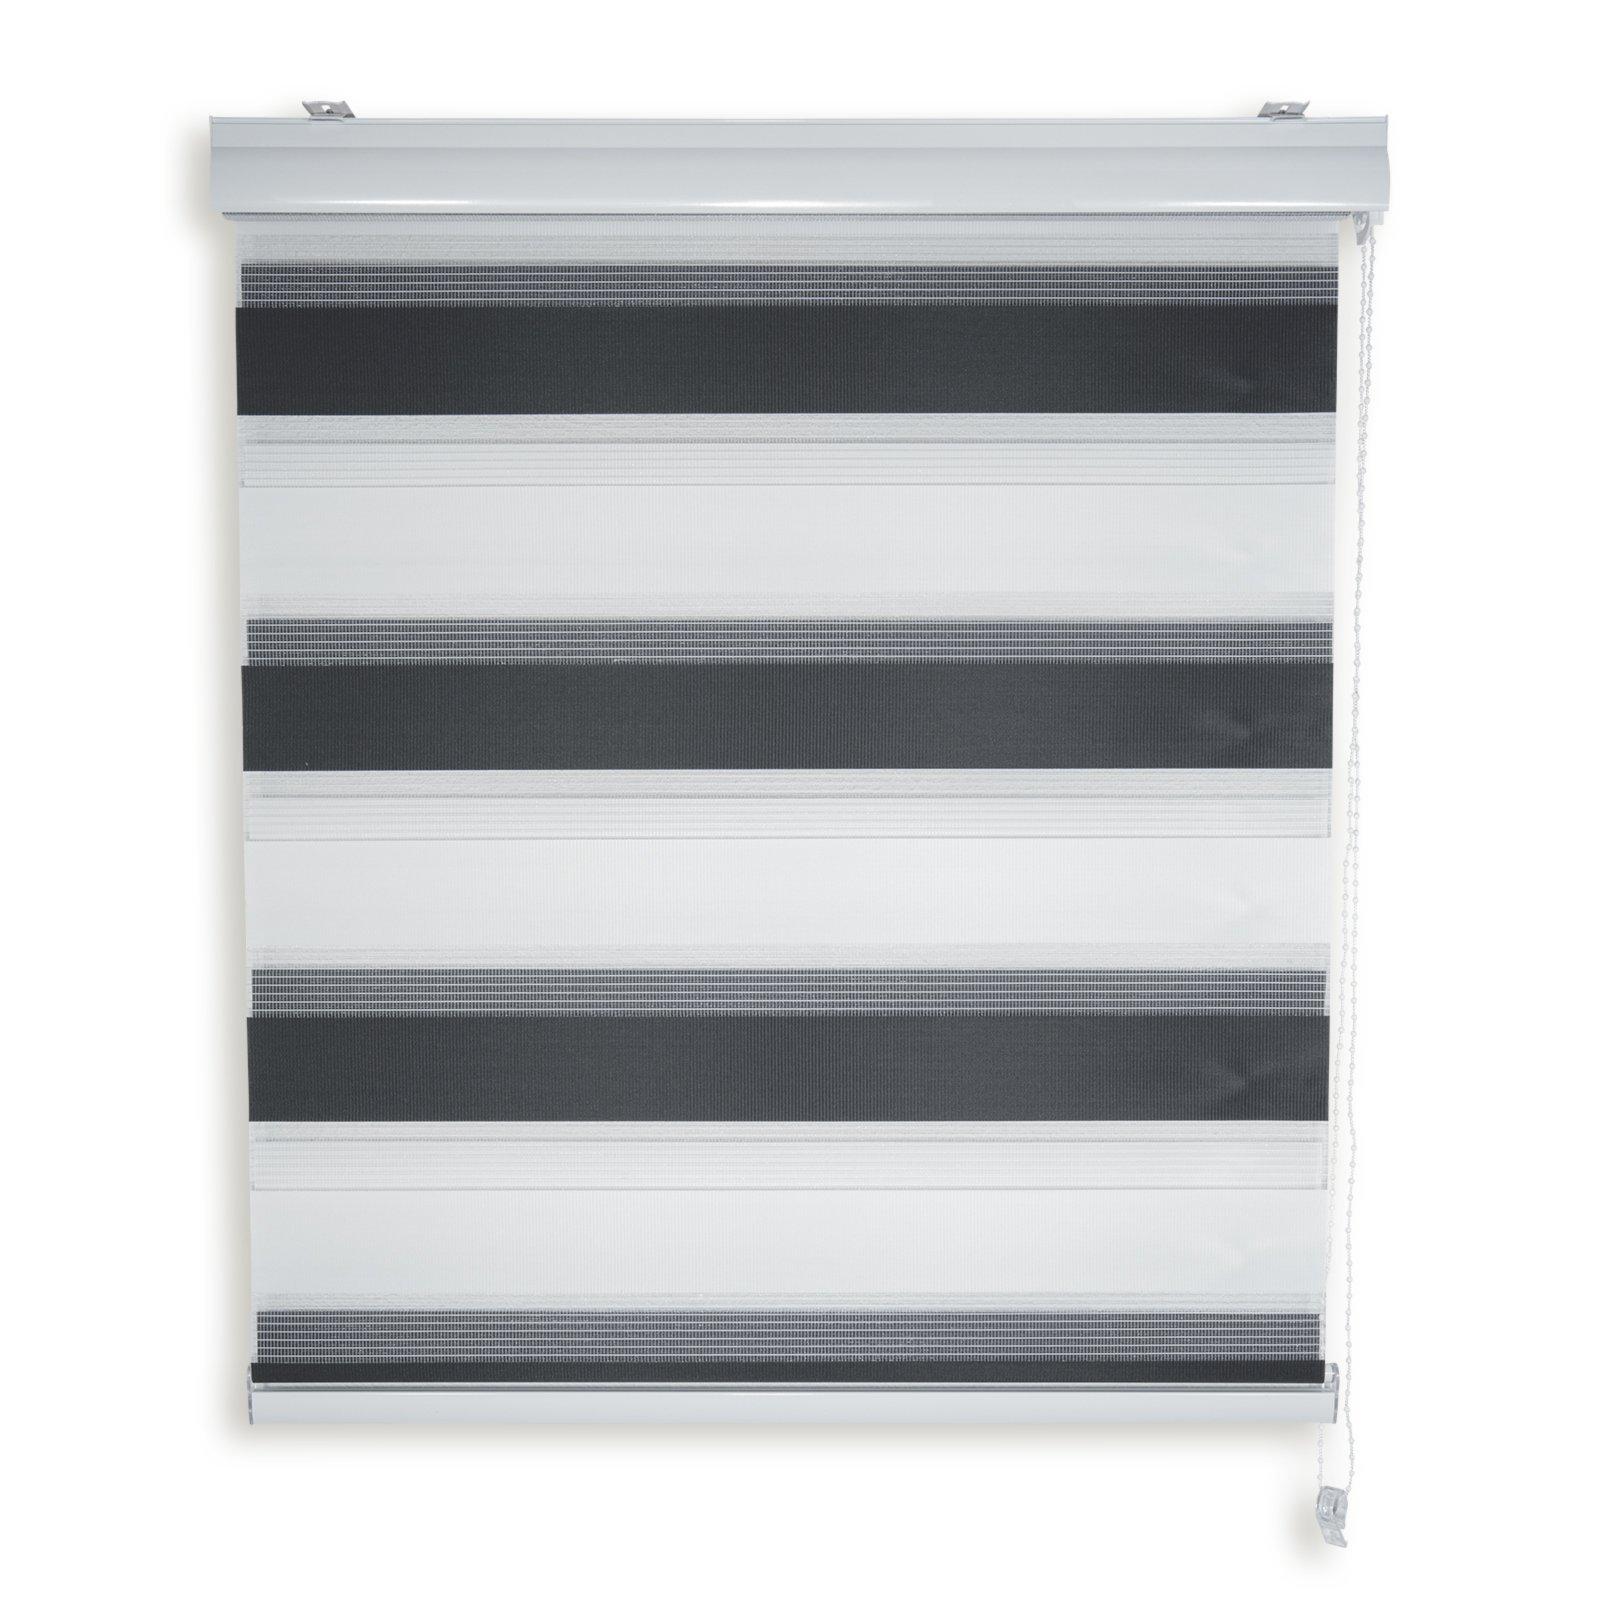 doppelrollo schwarz wei 60x180 cm. Black Bedroom Furniture Sets. Home Design Ideas